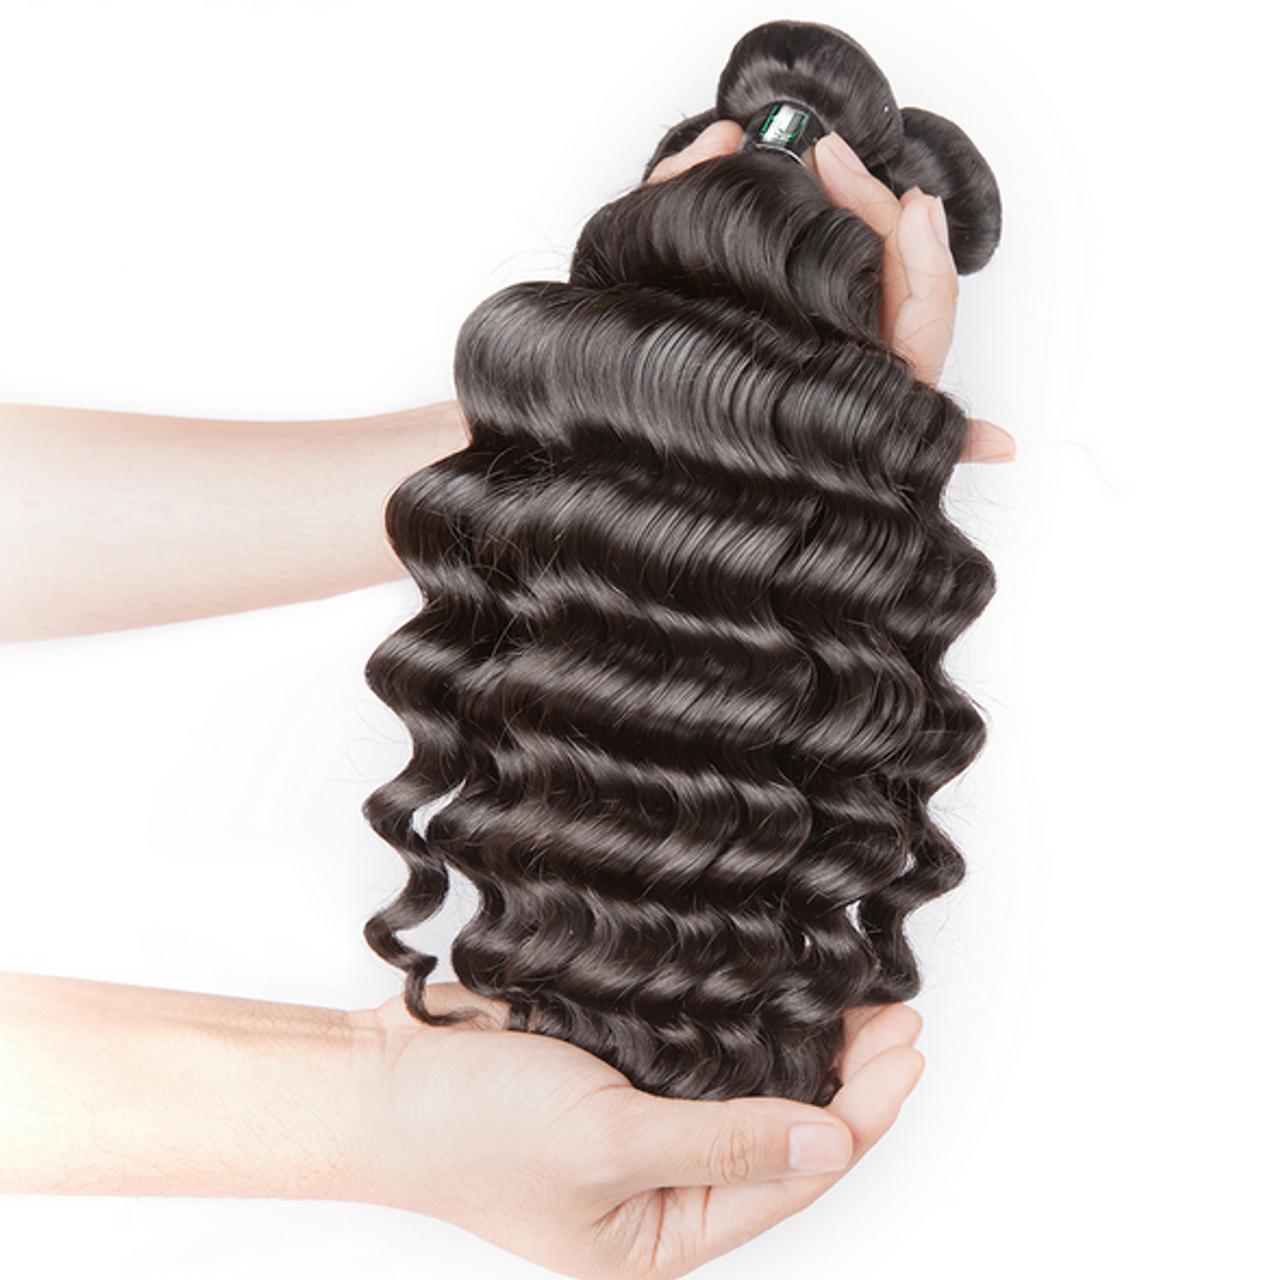 Peruvian Virgin Hair Deep Weave Curly Hair Bundles Human Hair Extensions Hair Weft 100g Bundle